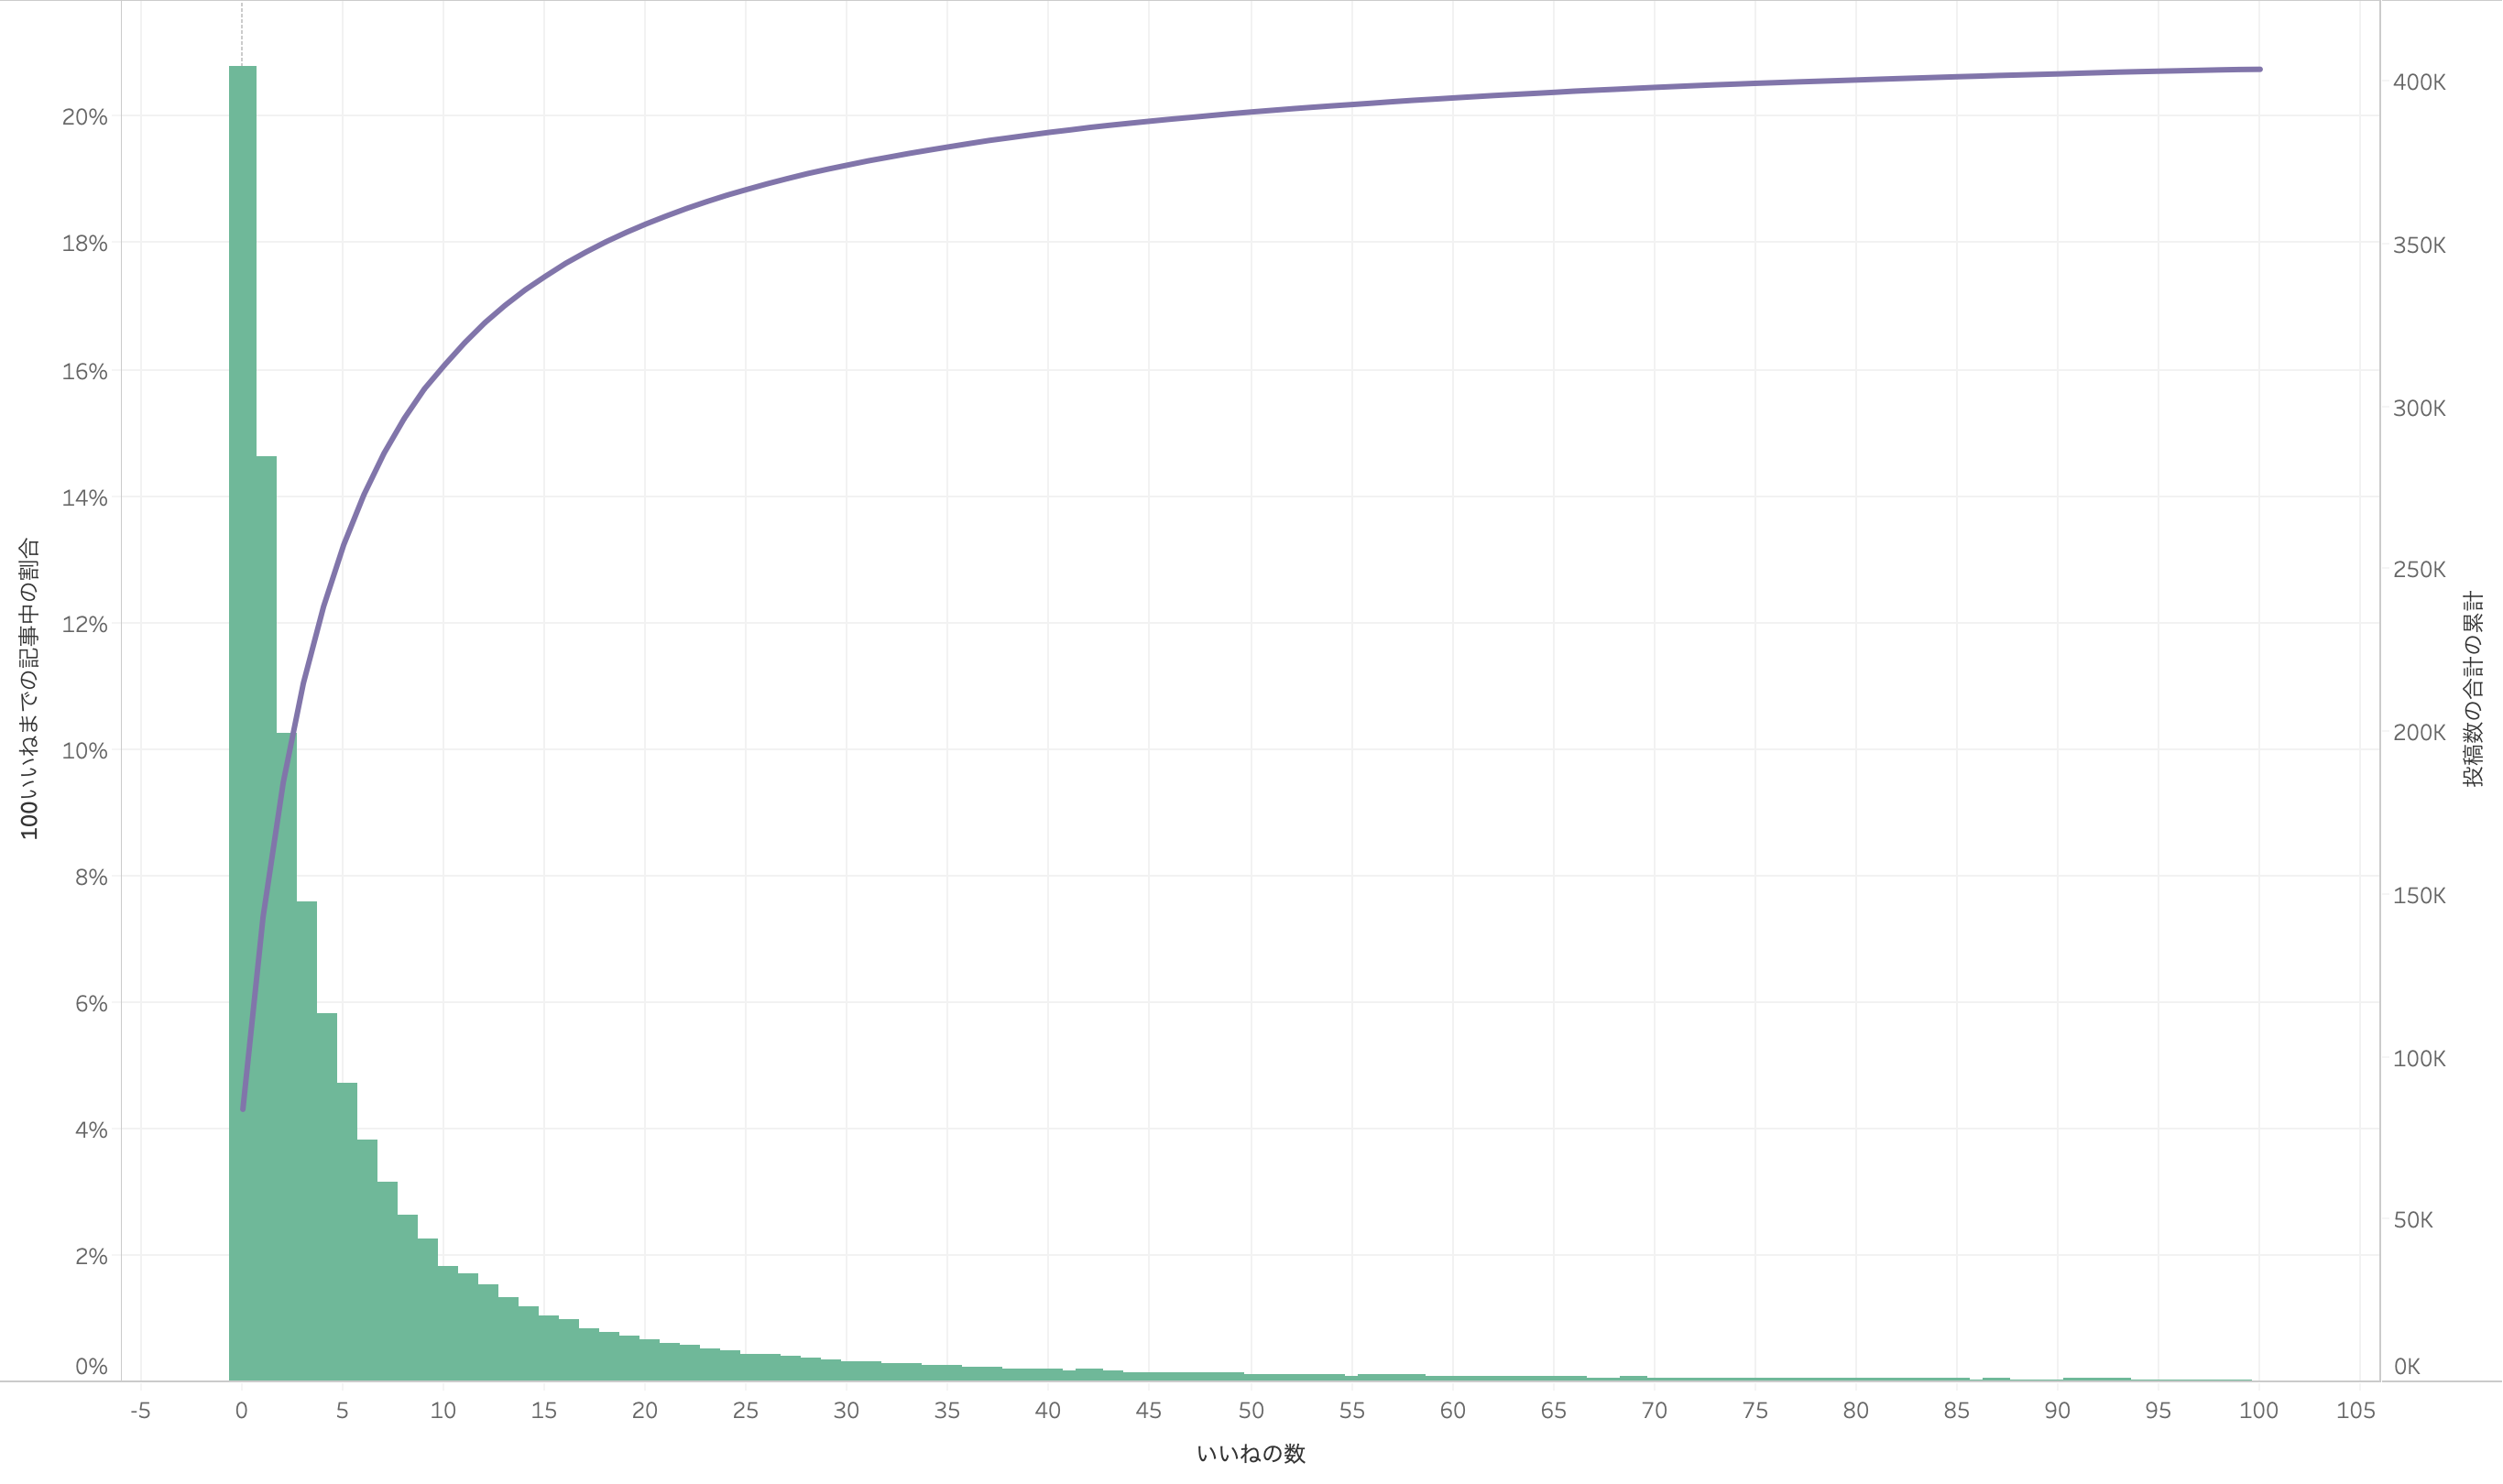 1_qiita_analytics_likes-count_histogram.png